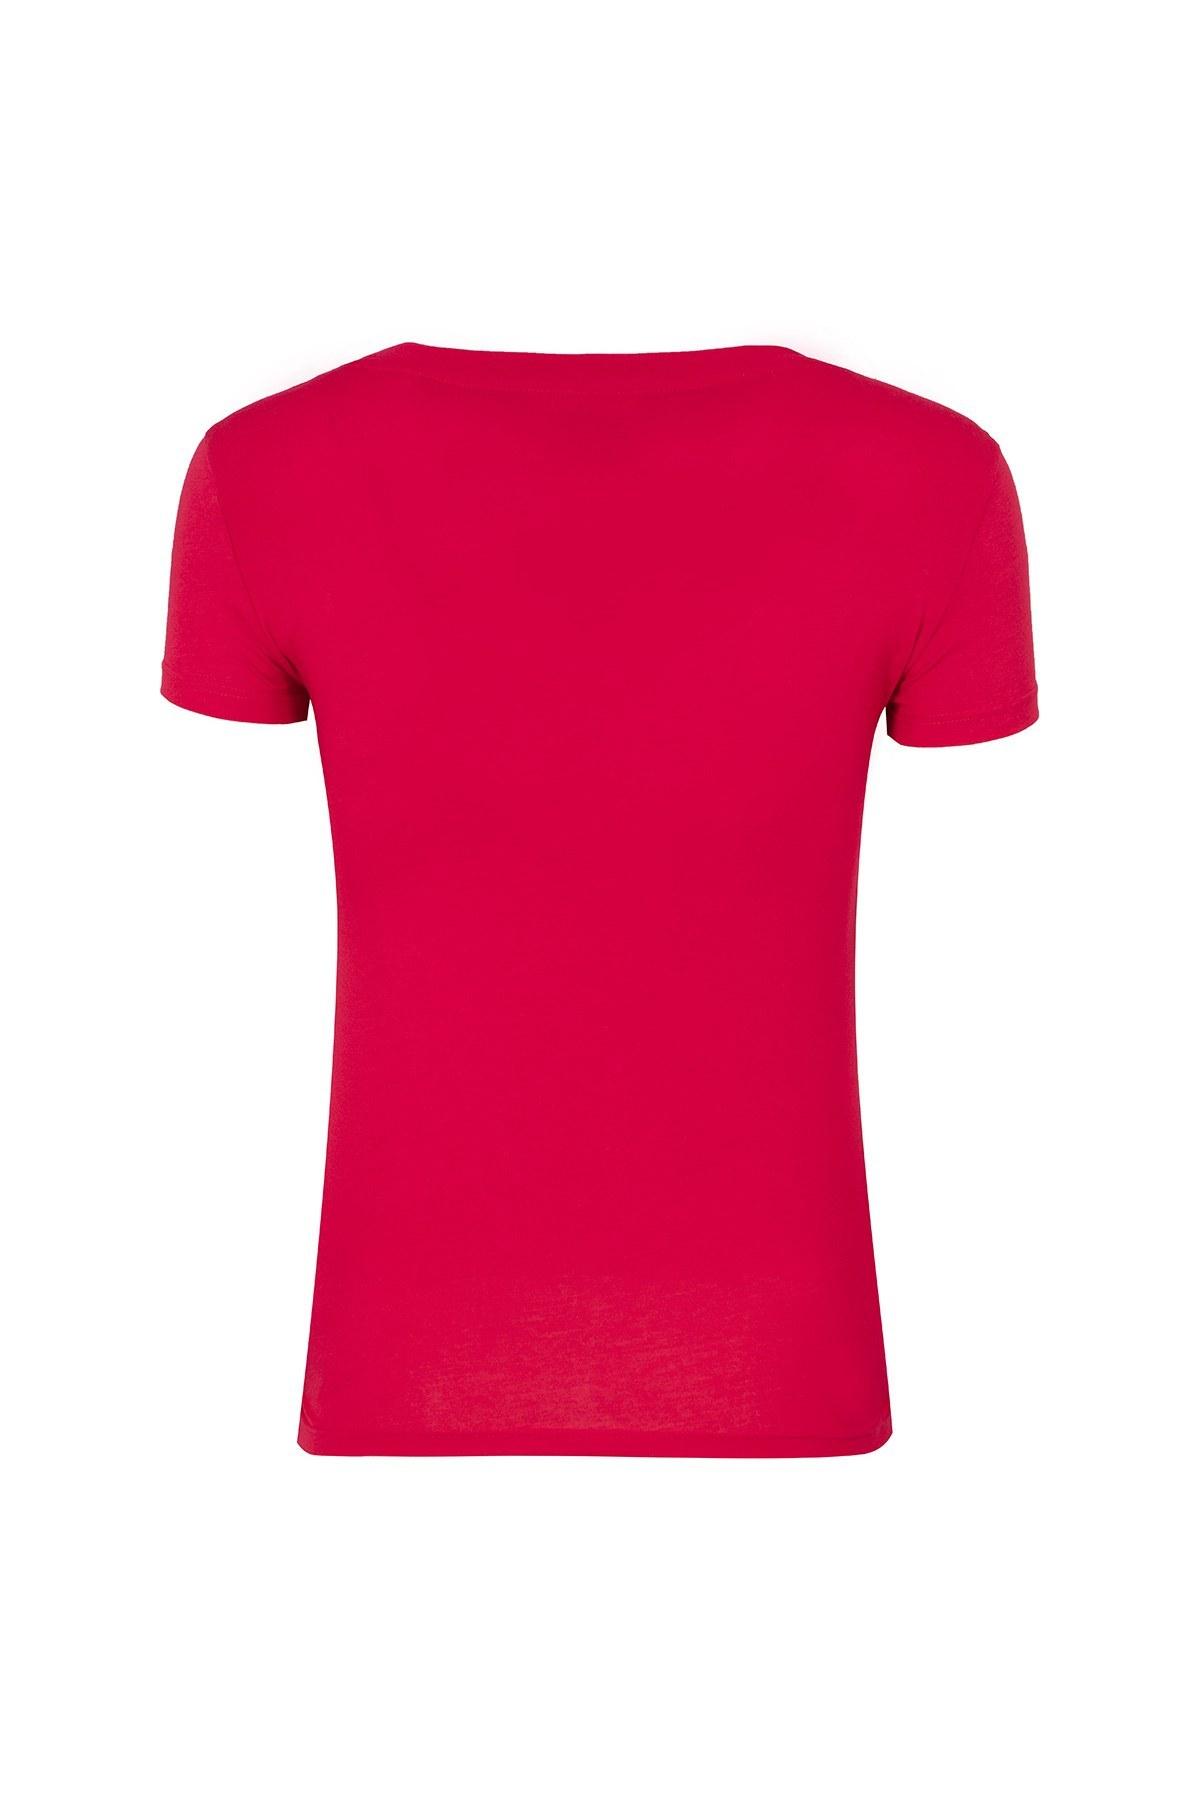 ARMANI EXCHANGE T SHIRT Kadın T Shirt 8NYT83 Y8A8Z 1445 KIRMIZI